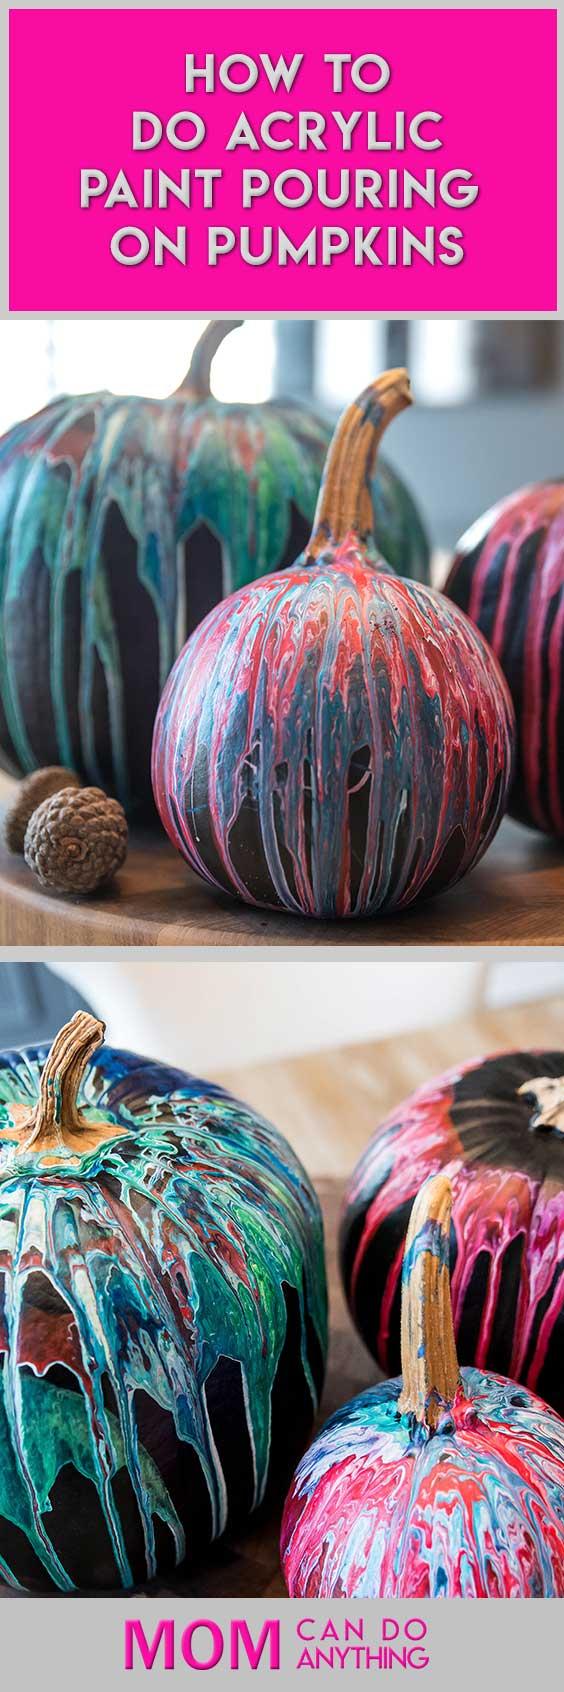 Paint-pouring-on-pumpkins